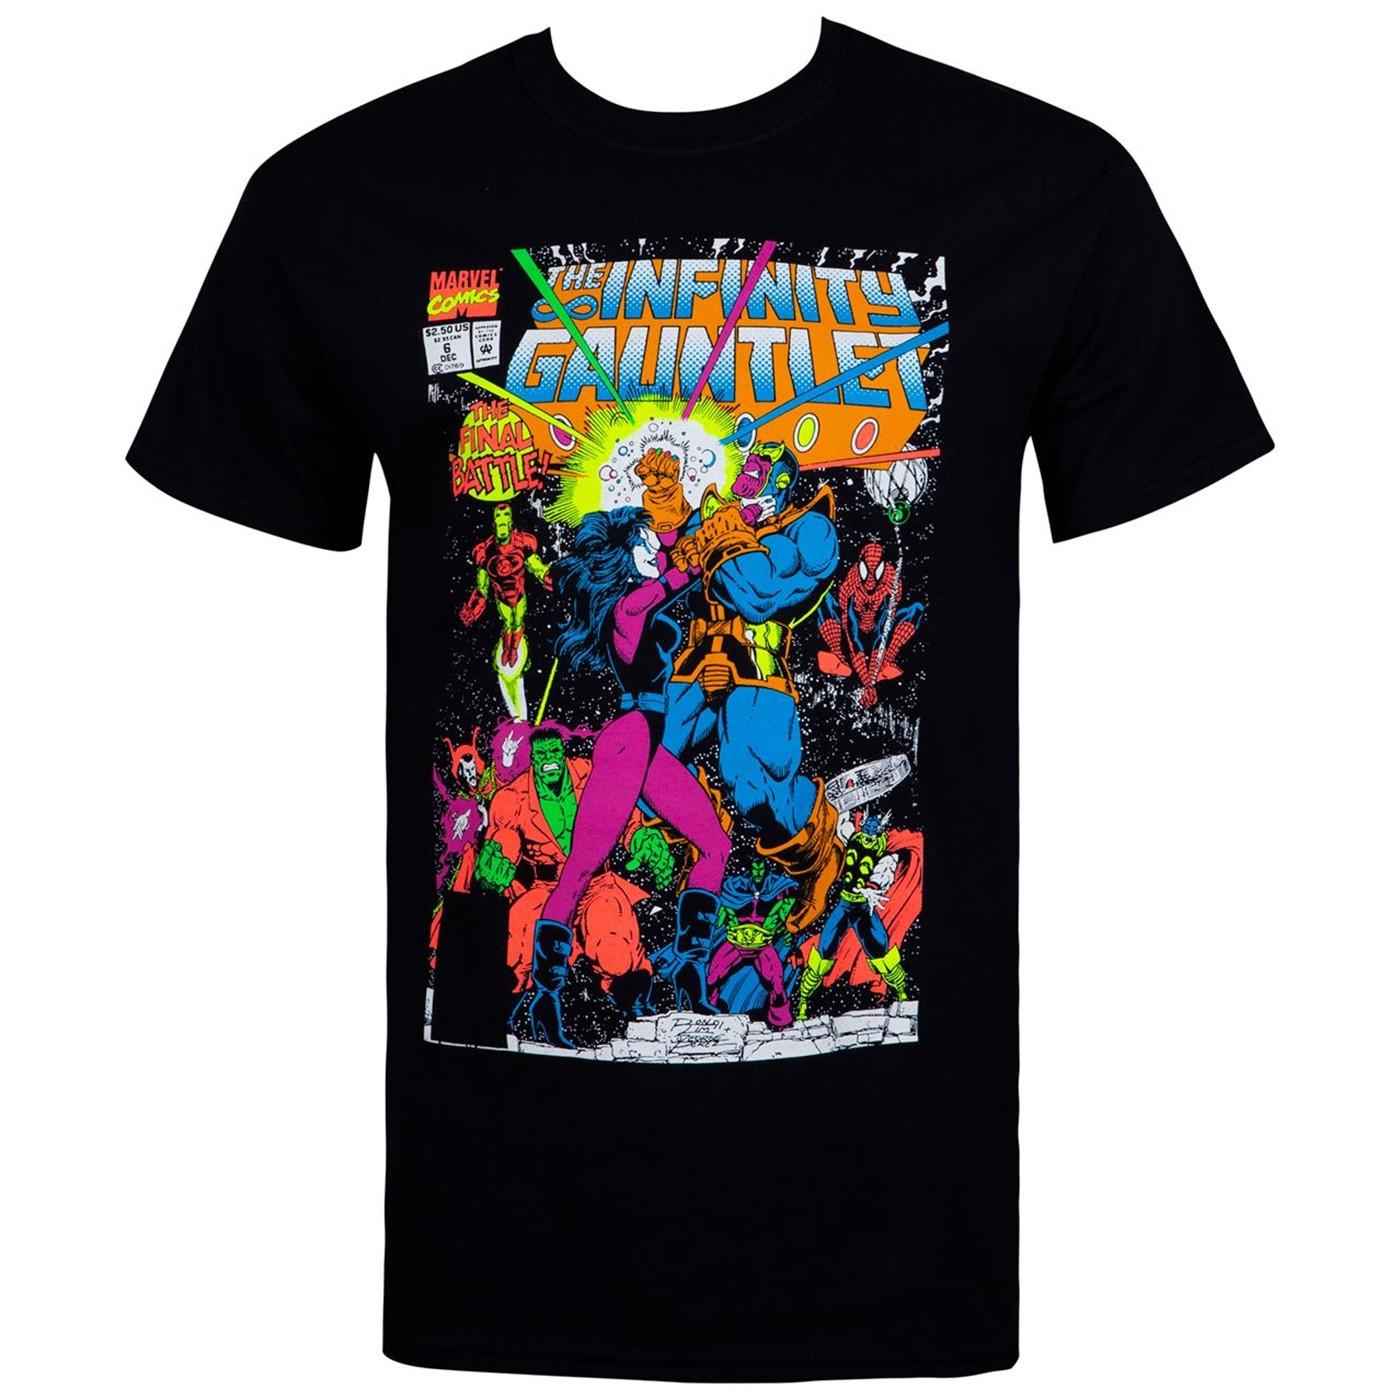 The Infinity Gauntlet Thanos Final Battle Comic Men's T-Shirt